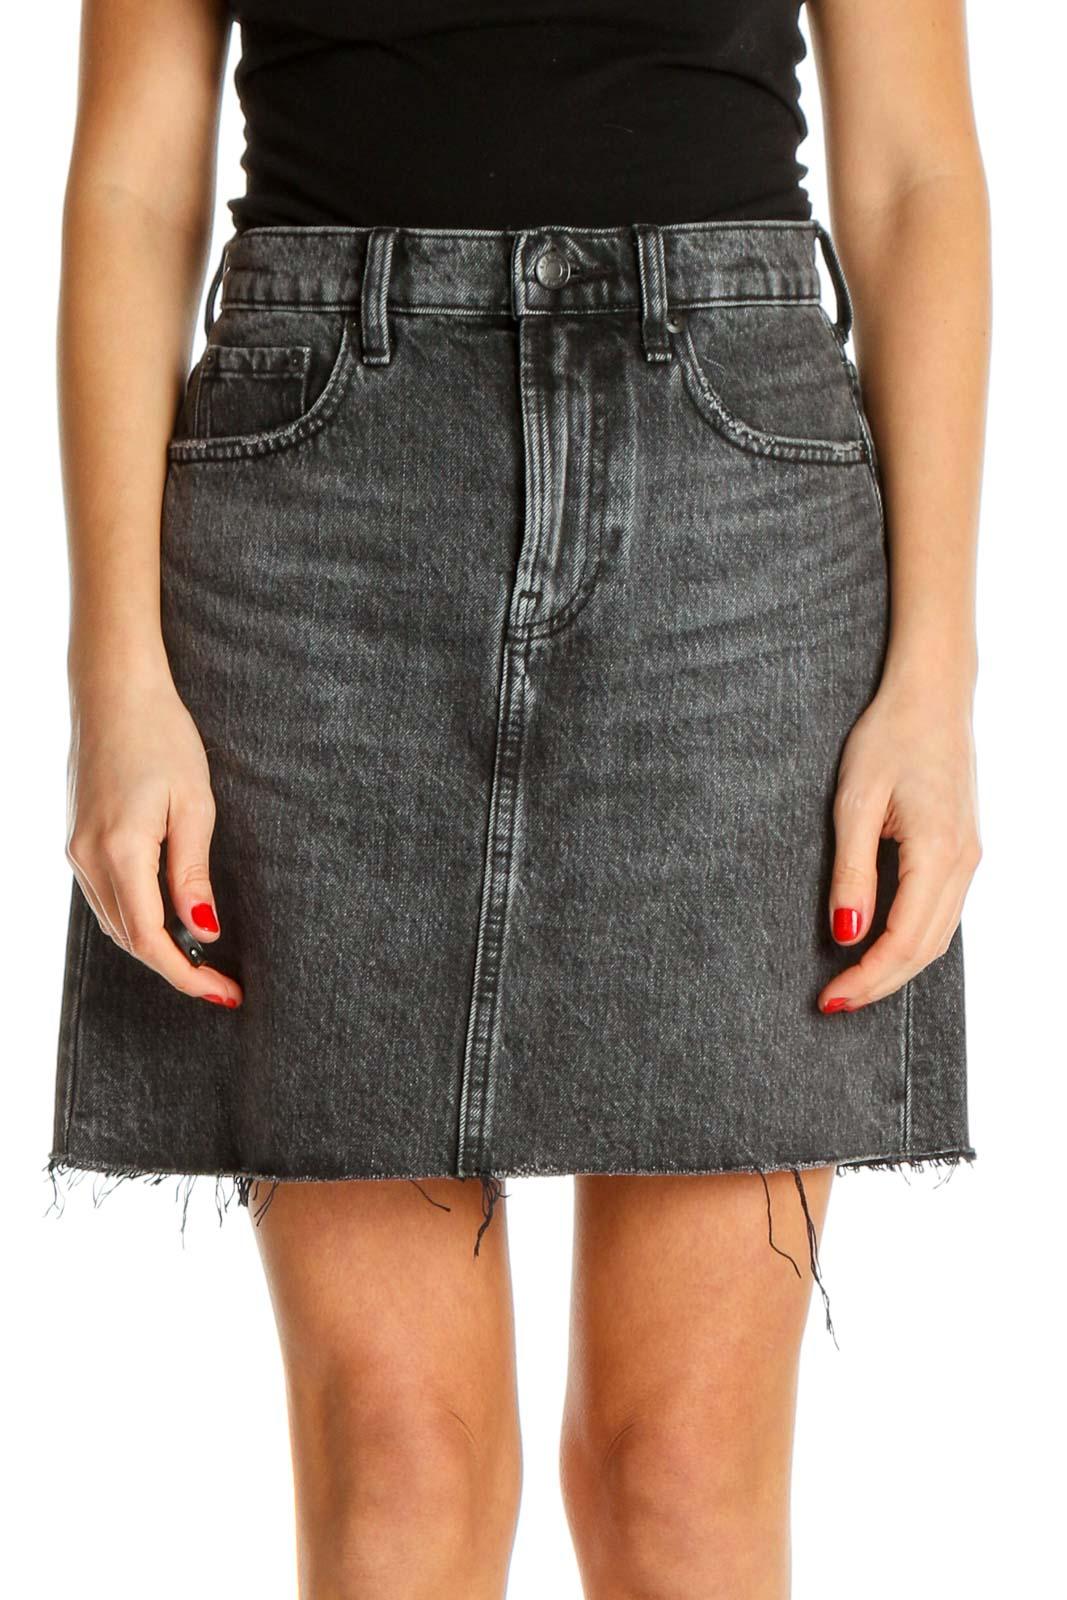 Black Textured Punk A-Line Skirt Front